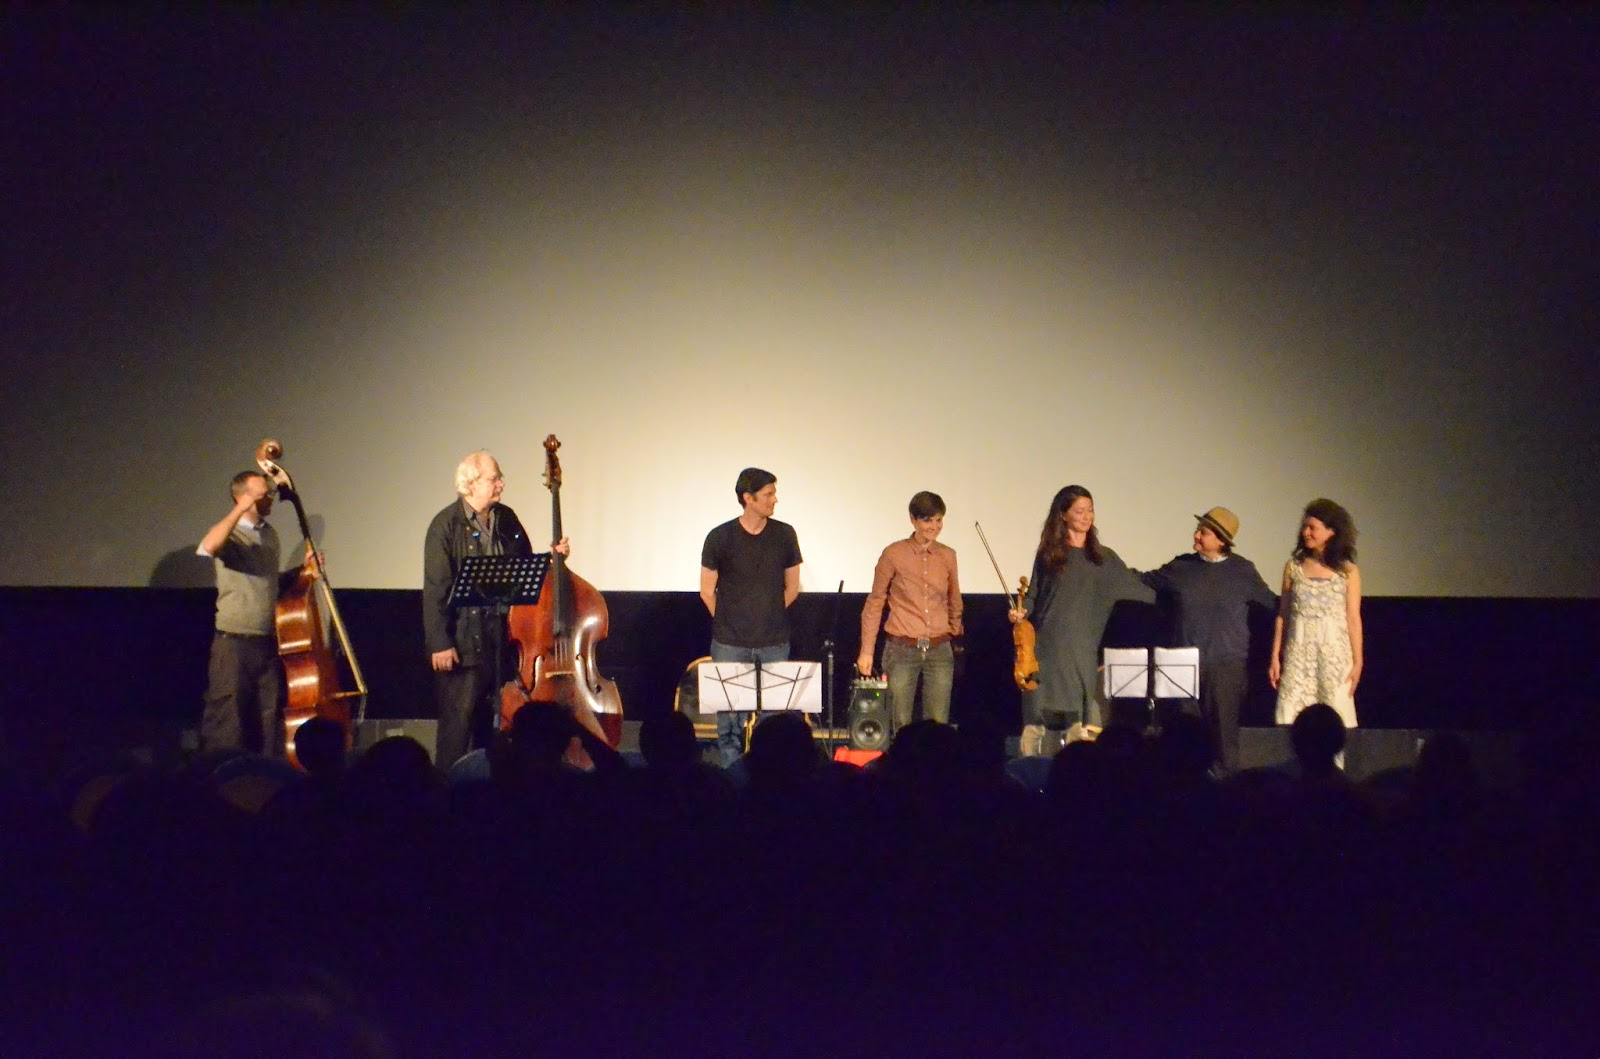 Tisha Mukarji (Composer / Conductor), Margareth Kammerer (Voice), Derek Shirley (Contrabass), Klaus Kürvers (Contrabass), Ayumi Paul (Violin), Sabine Ercklentz (Trumpet), Bryan Eubanks (Soprano Saxophone)